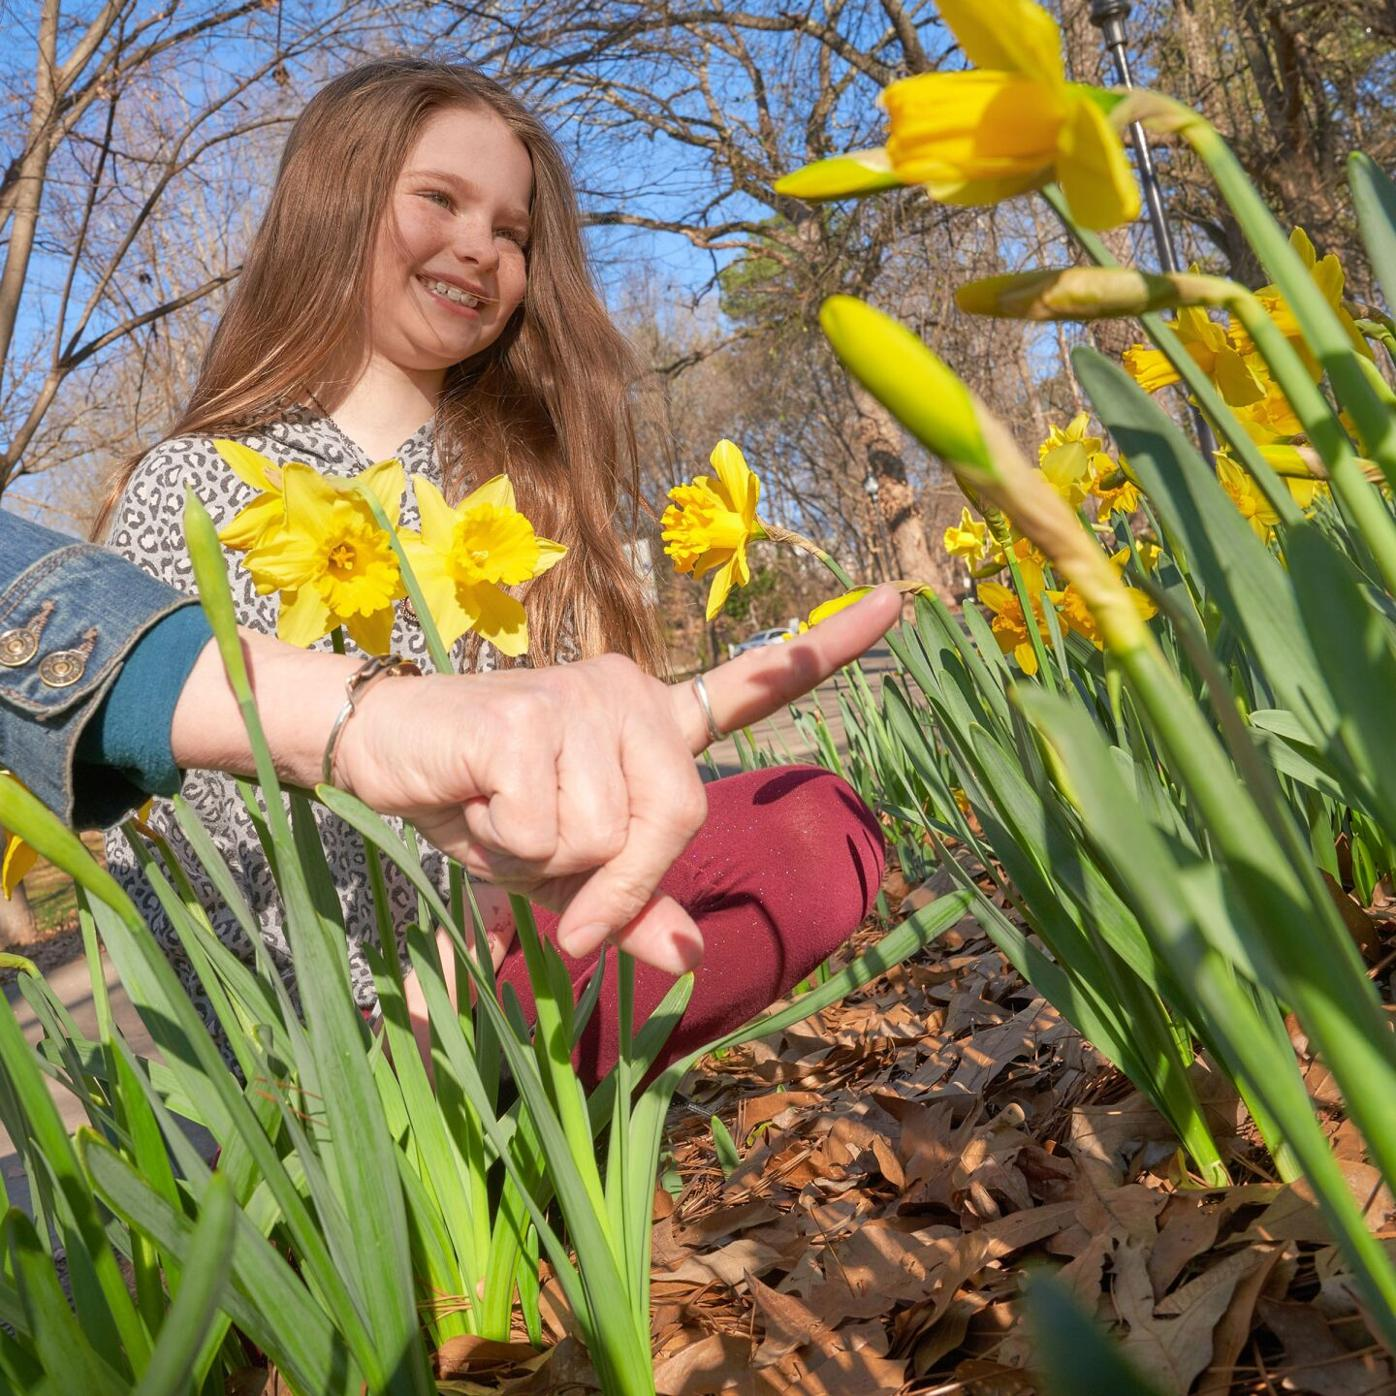 031021_MNS_Daffodil_Project_001 girl